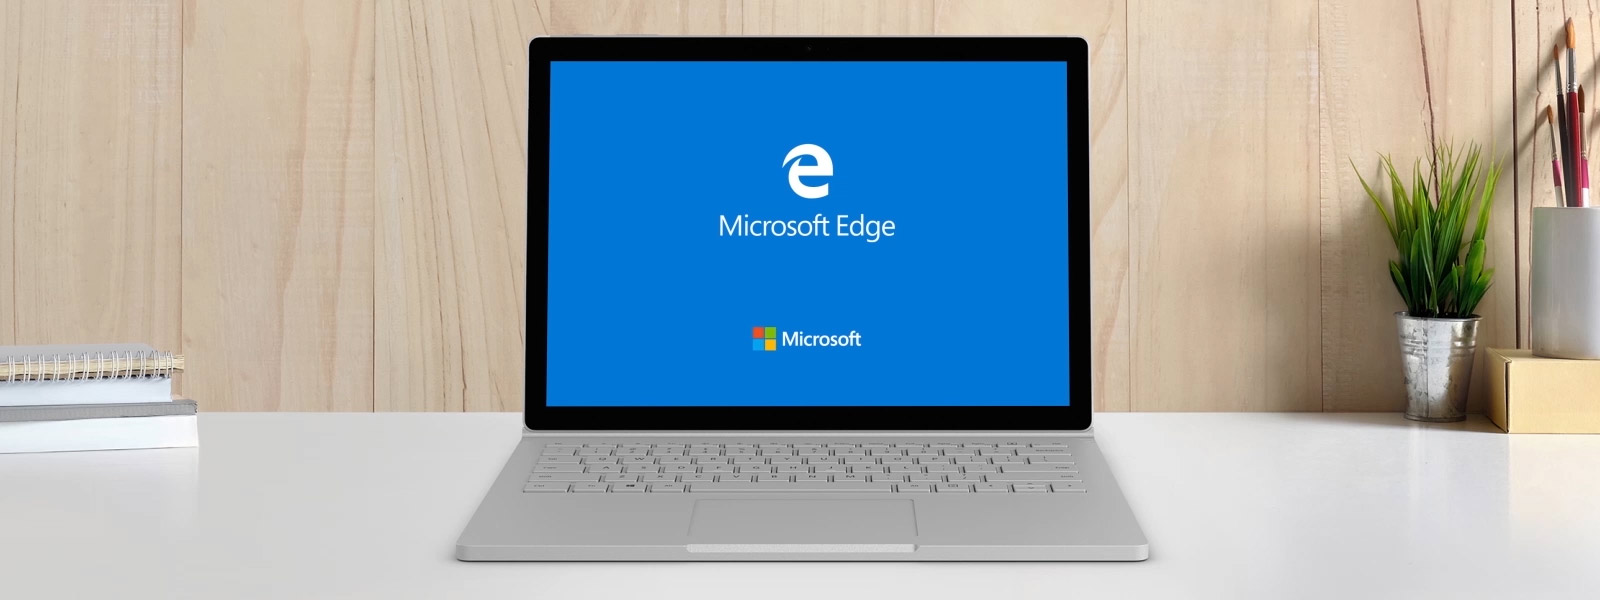 sichern Sie Microsoft Edge